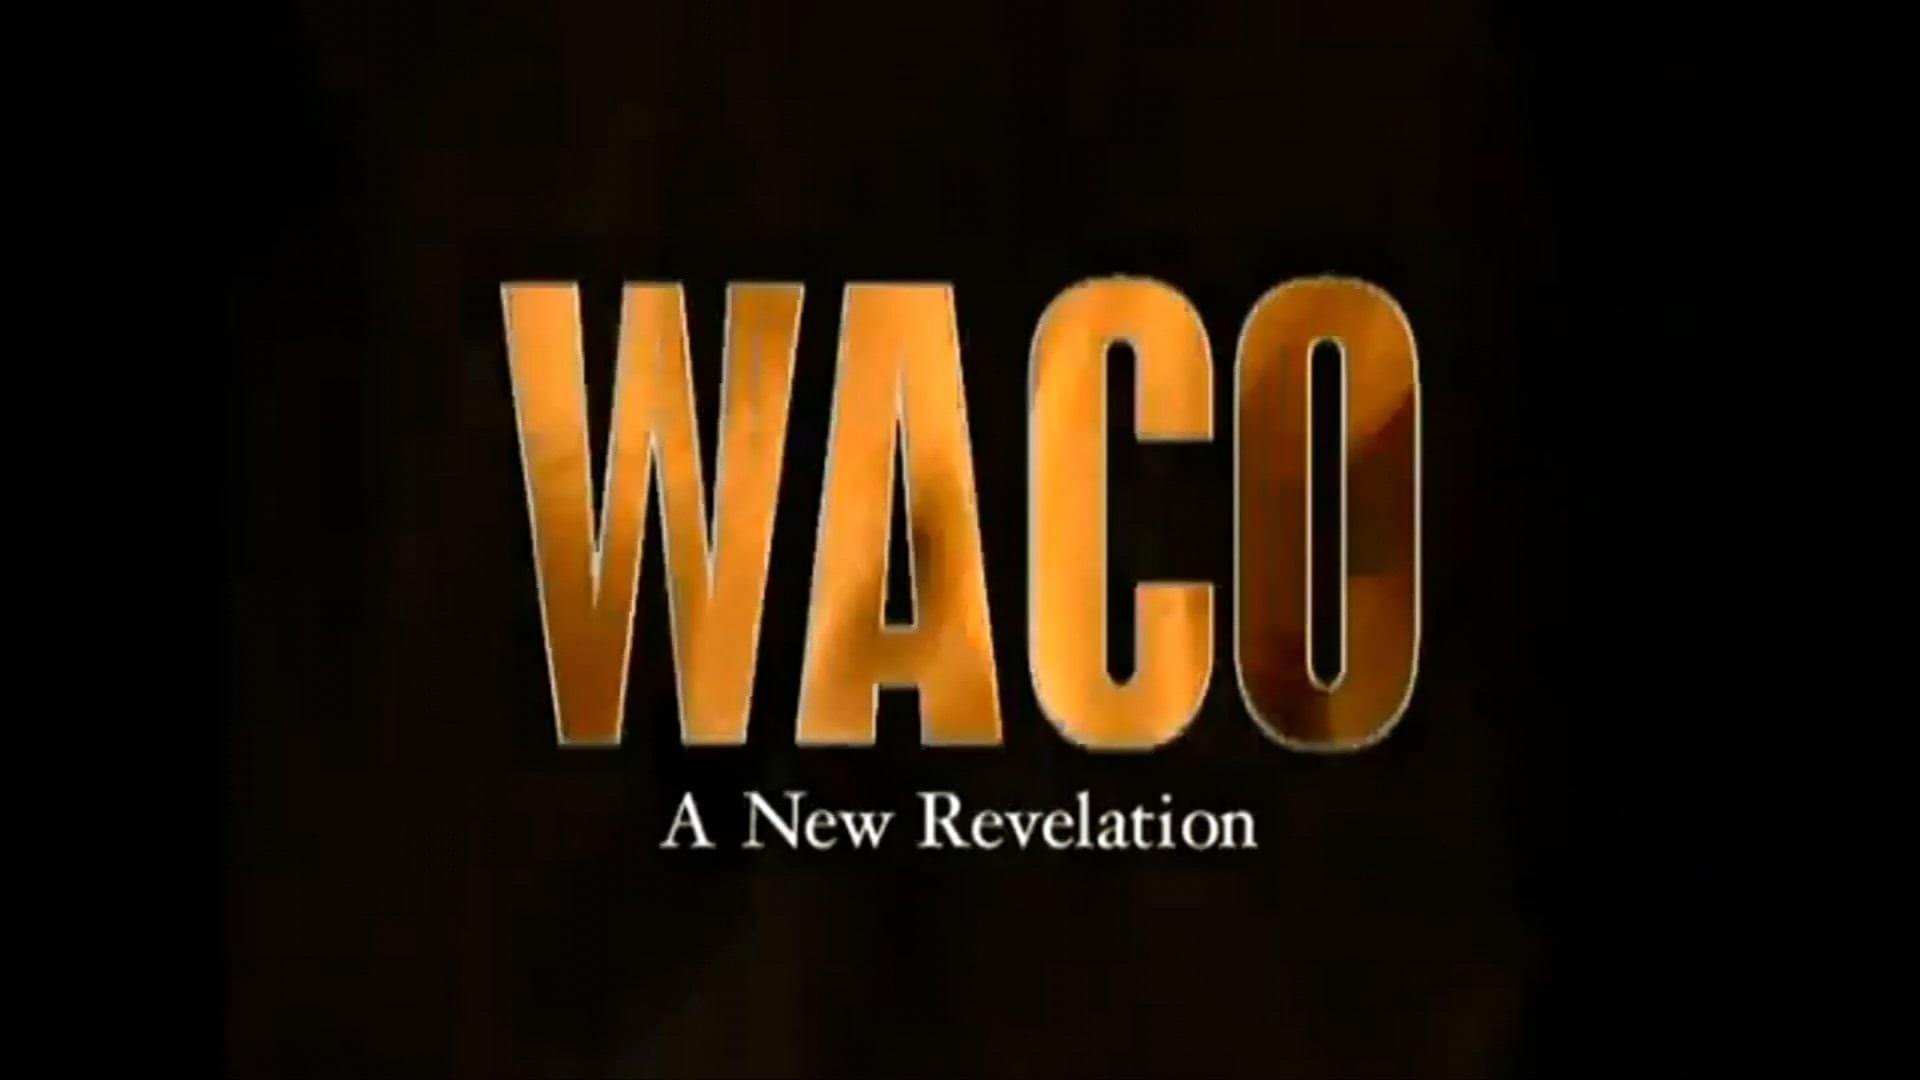 waco a new revelation 1999 watch free primewire